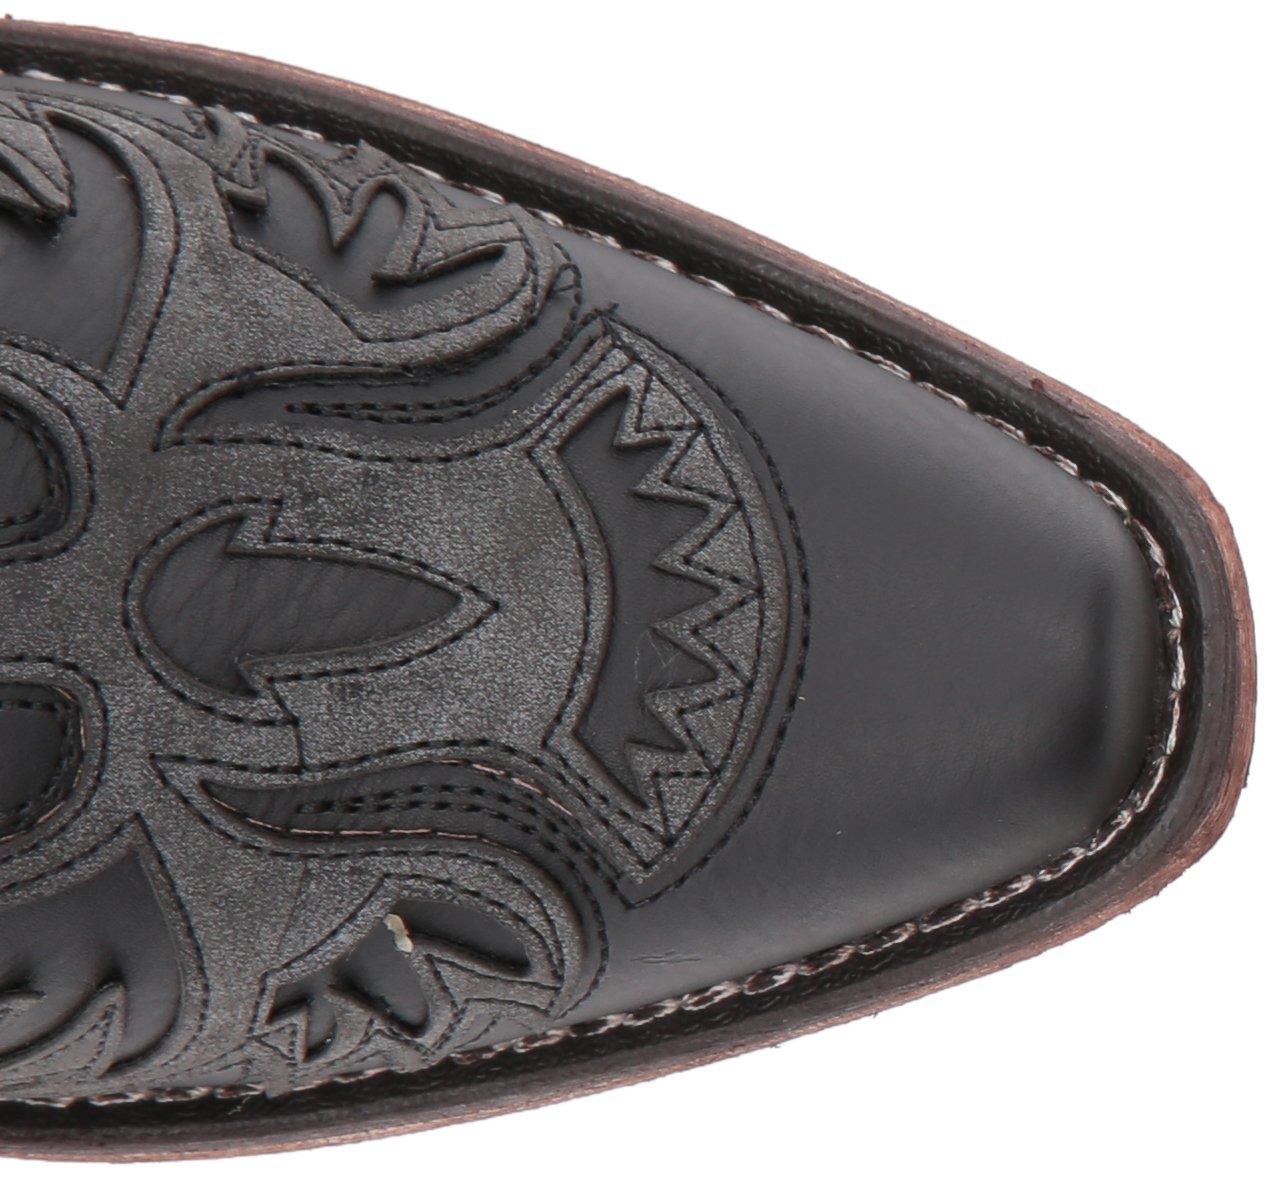 Roper Women's Amelia Western Boot B074D3RJ1F 5.5 B(M) US Black